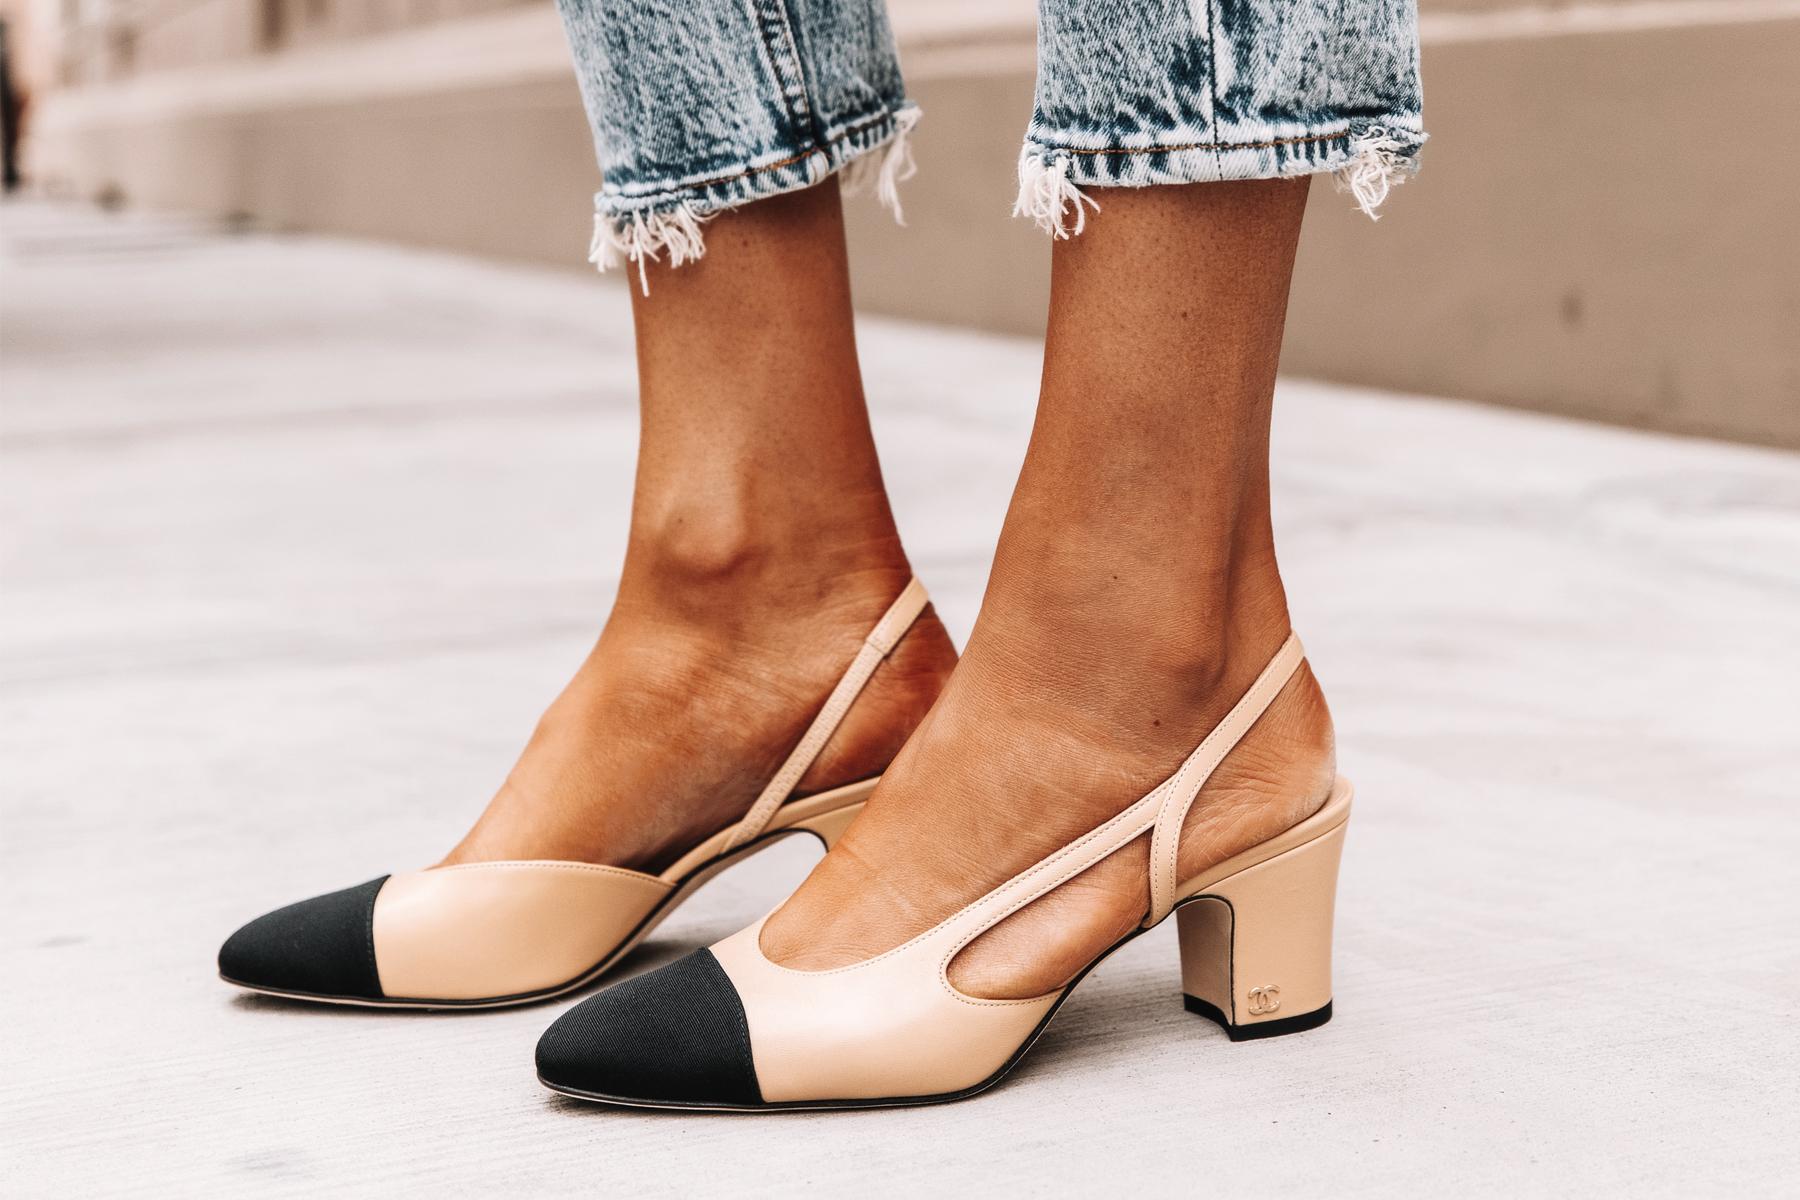 Fashion Jackson Chanel Slingbacks